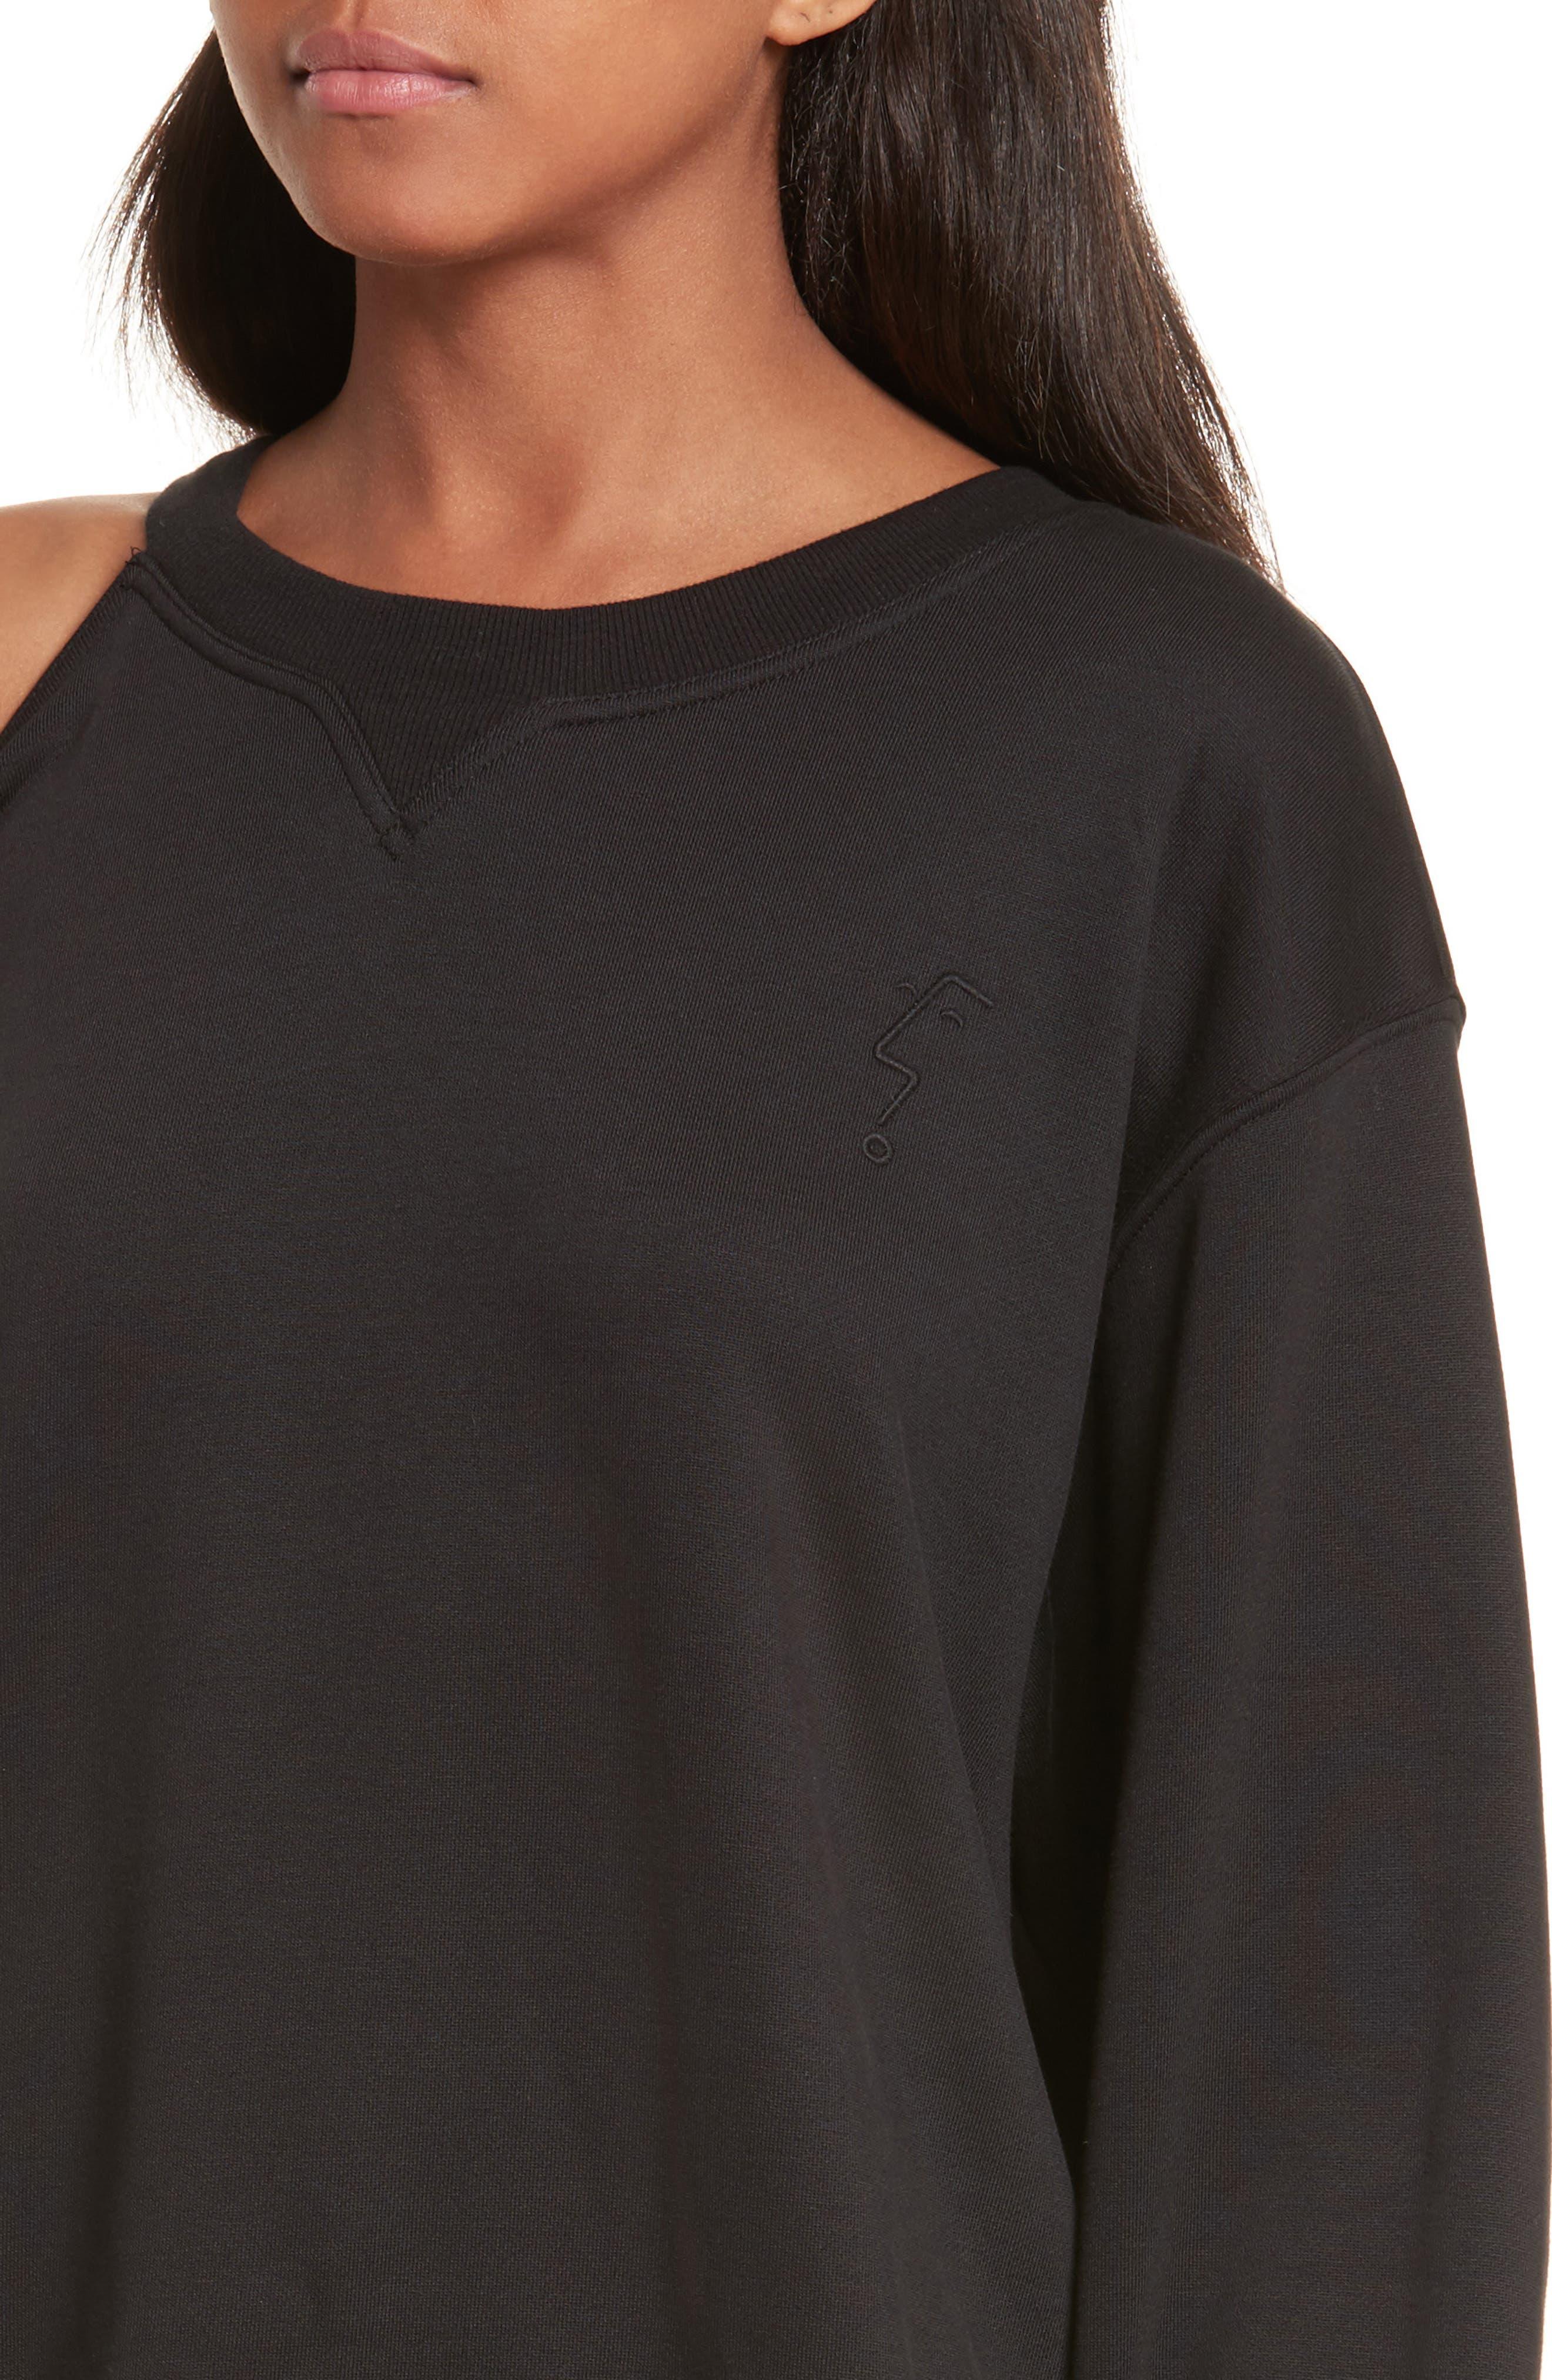 Asymmetrical Cold Shoulder Sweatshirt,                             Alternate thumbnail 4, color,                             001